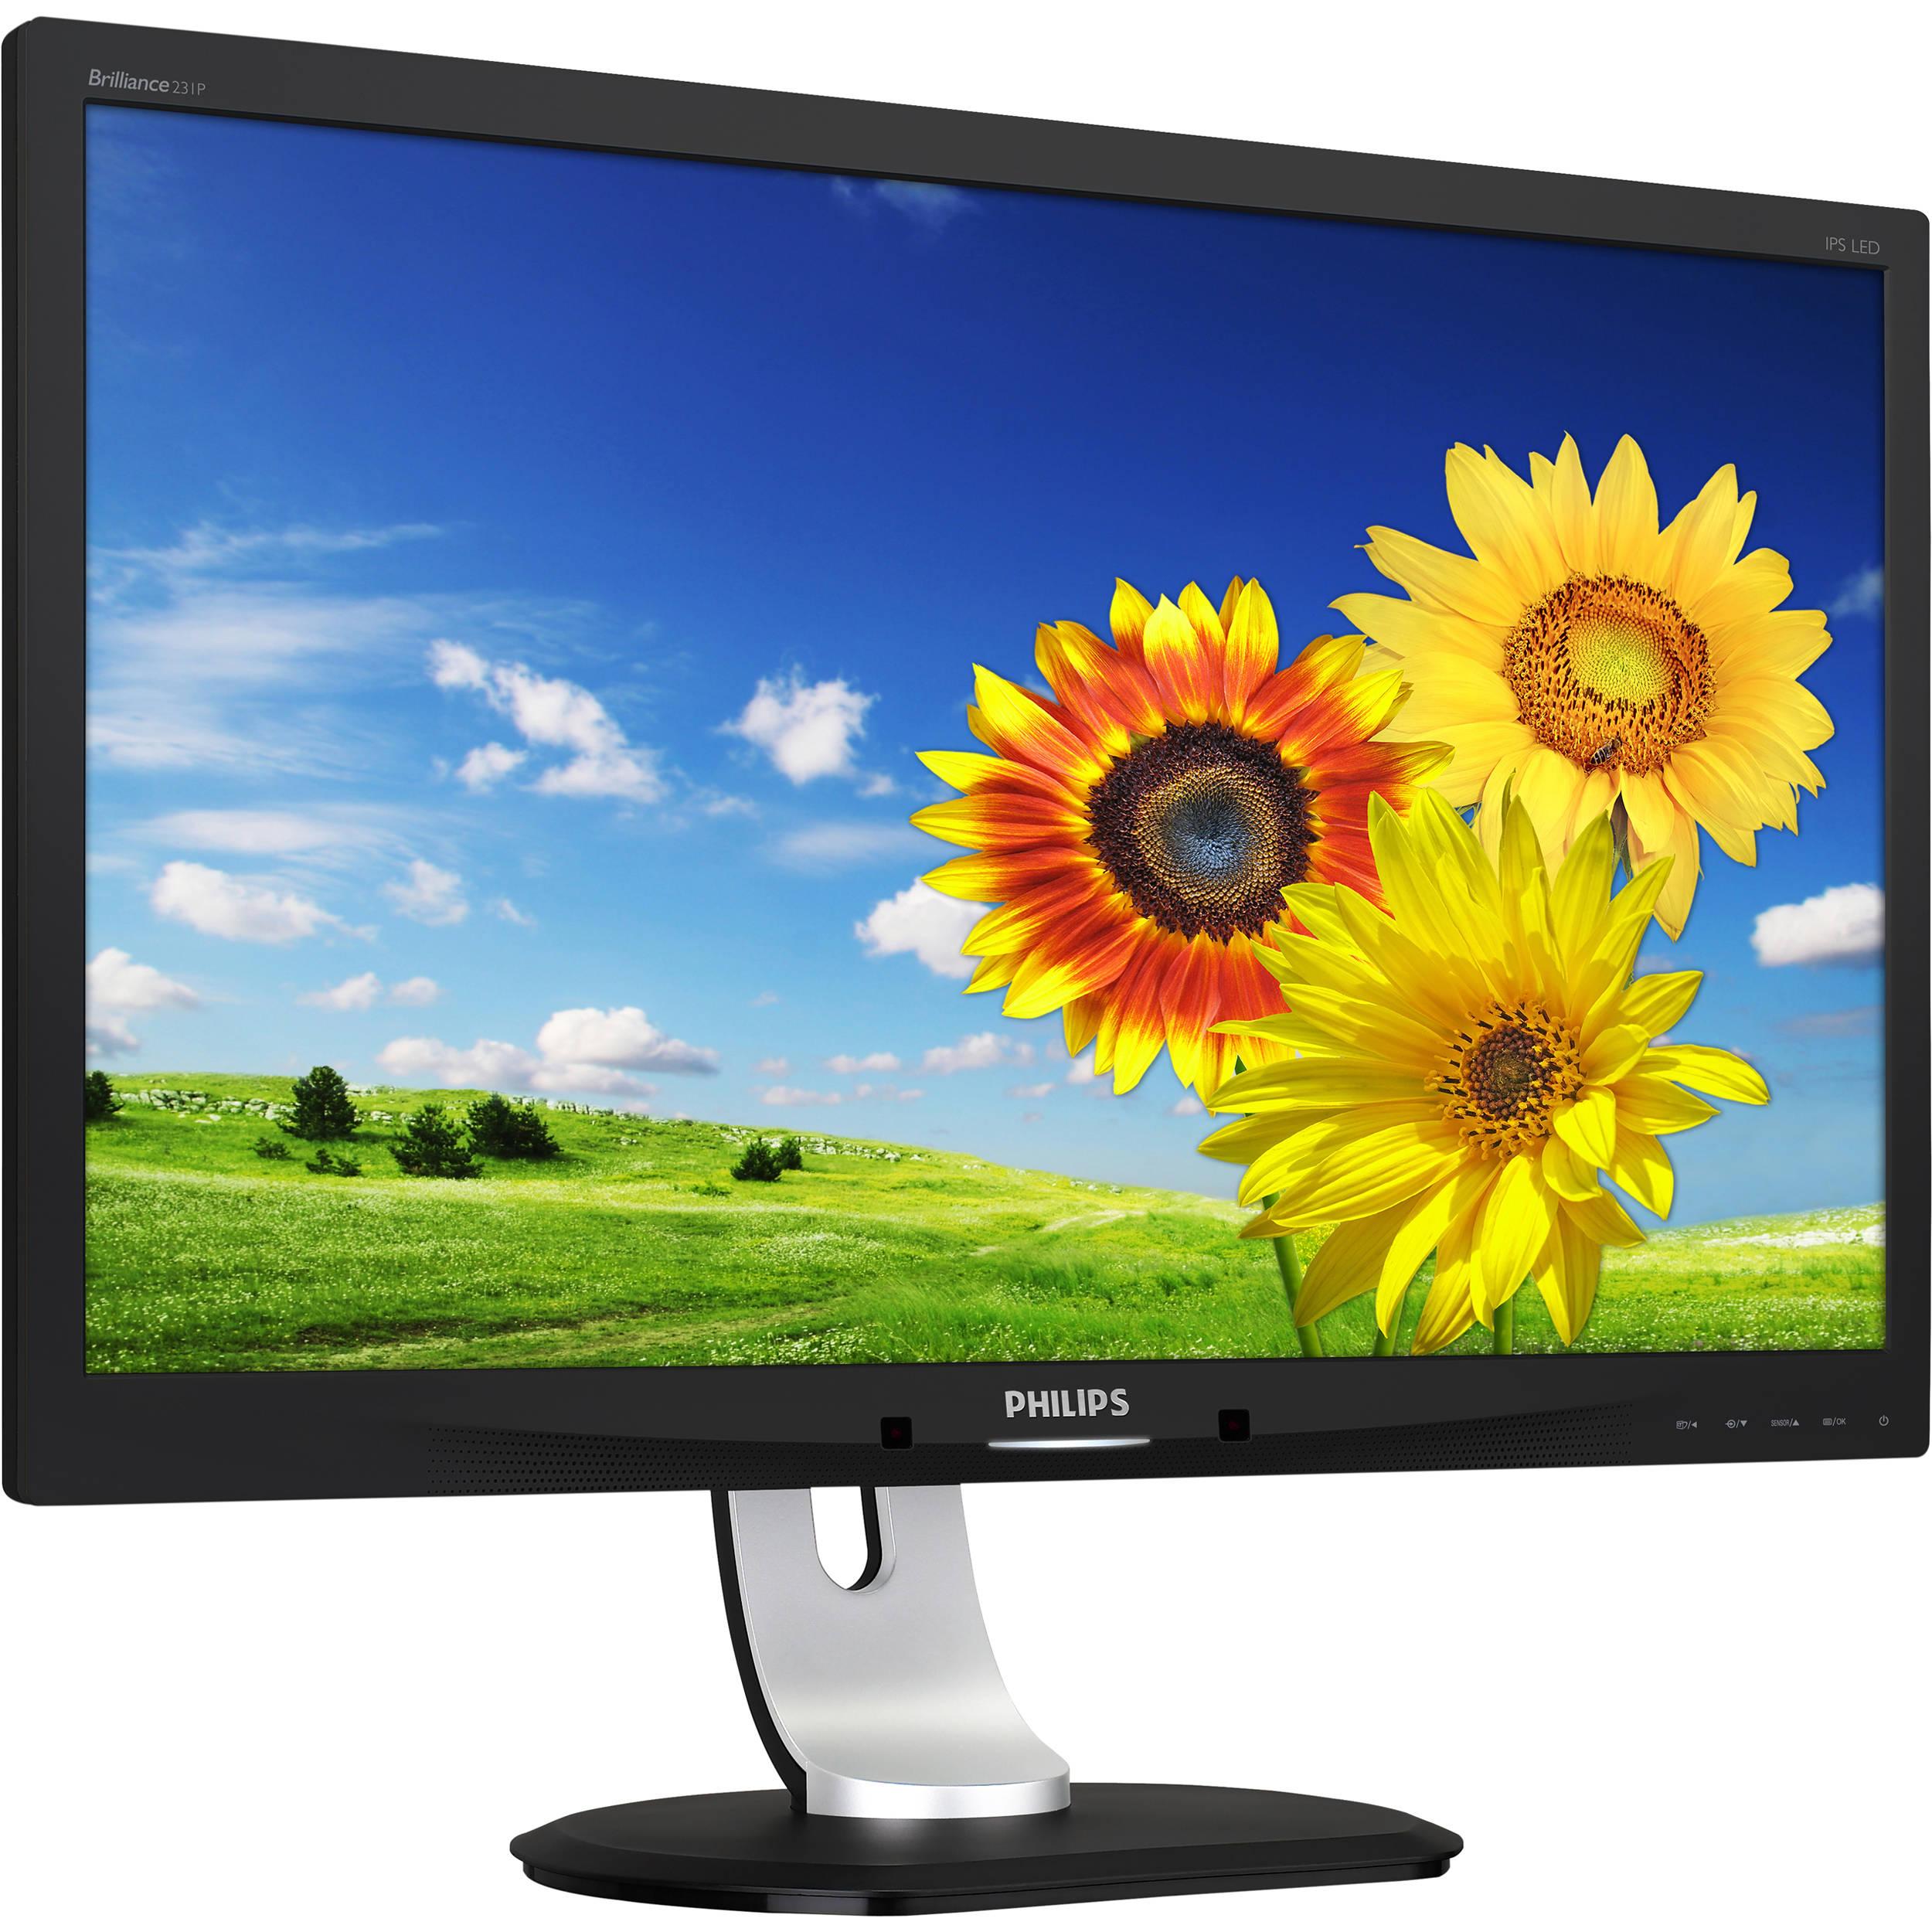 philips 231p4qupeb 23 16 9 ips monitor 231p4qupeb b h